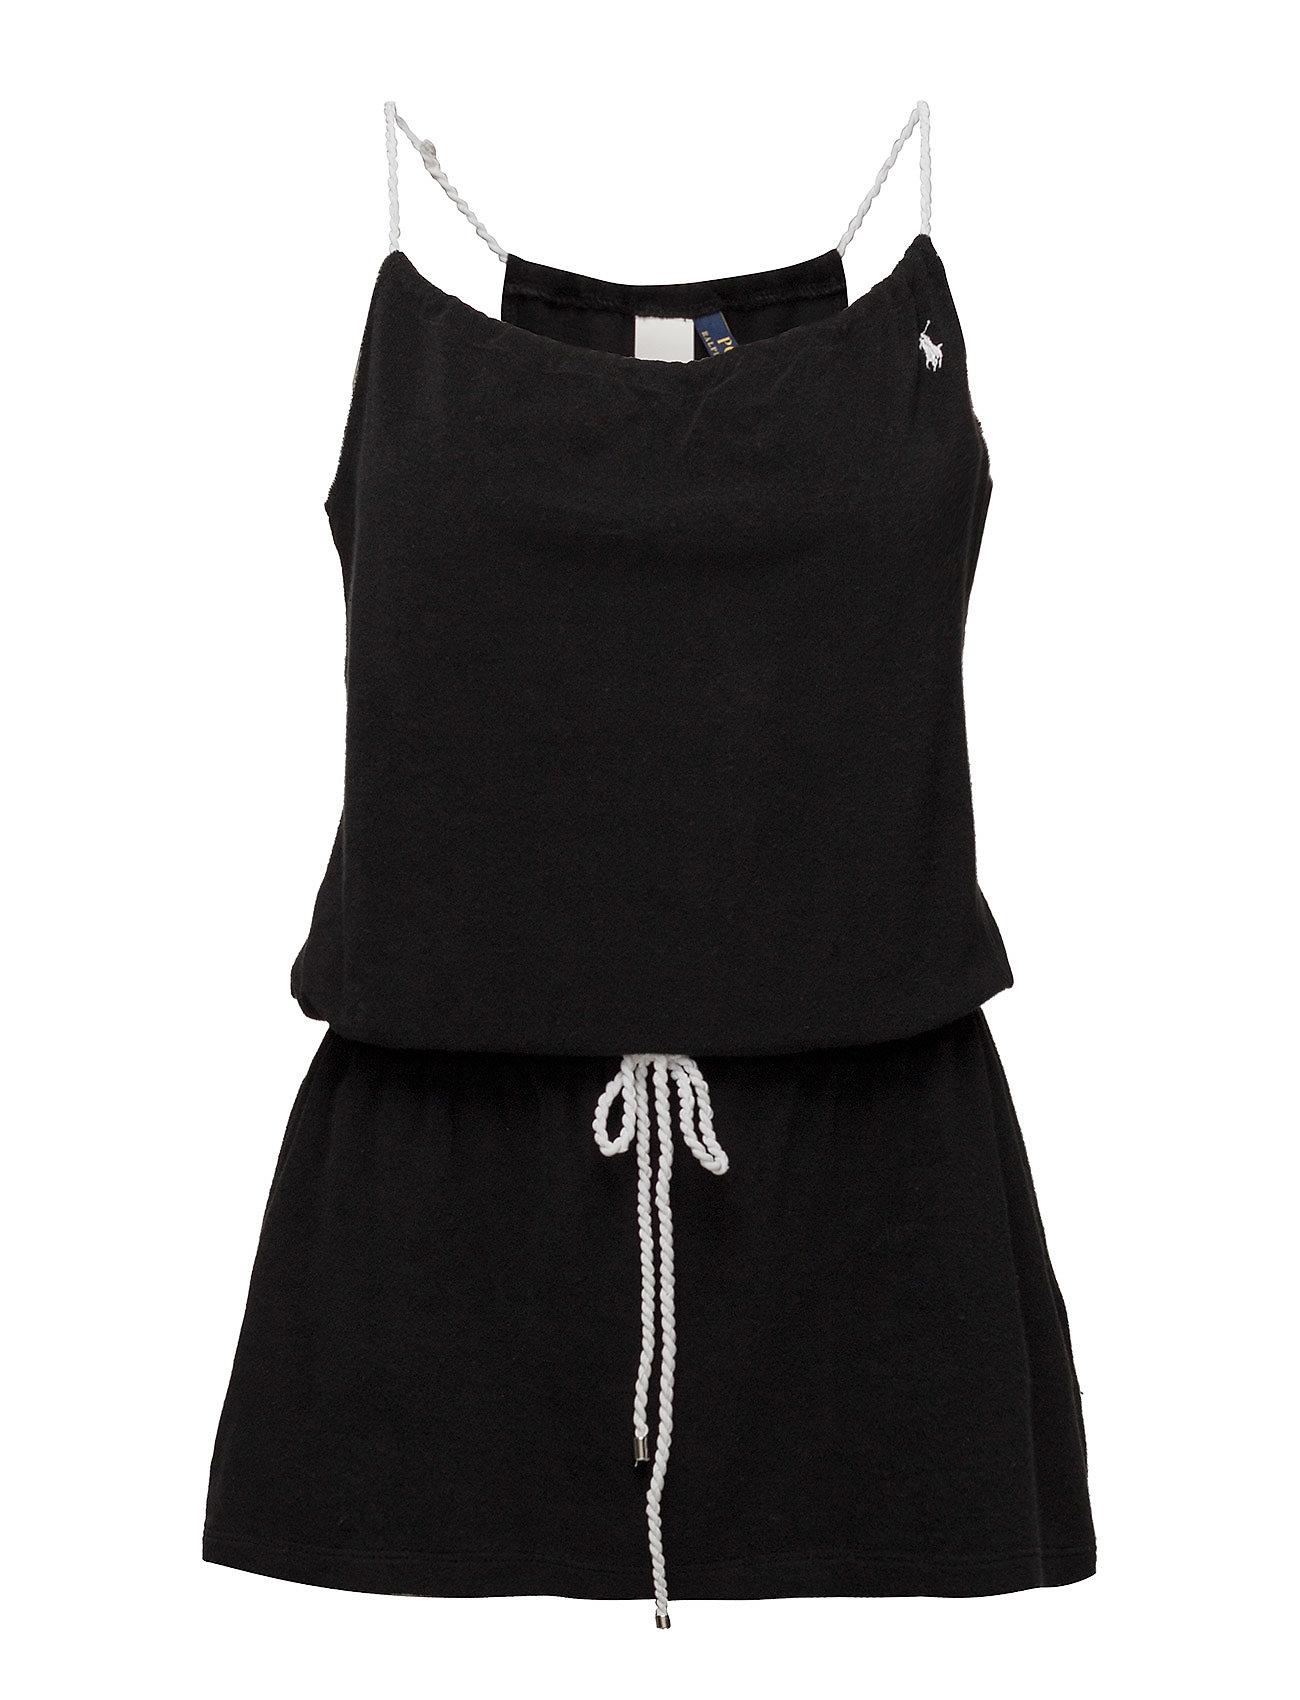 Polo Ralph Lauren Swimwear ICONIC TERRY COVERS ROPE DRESS